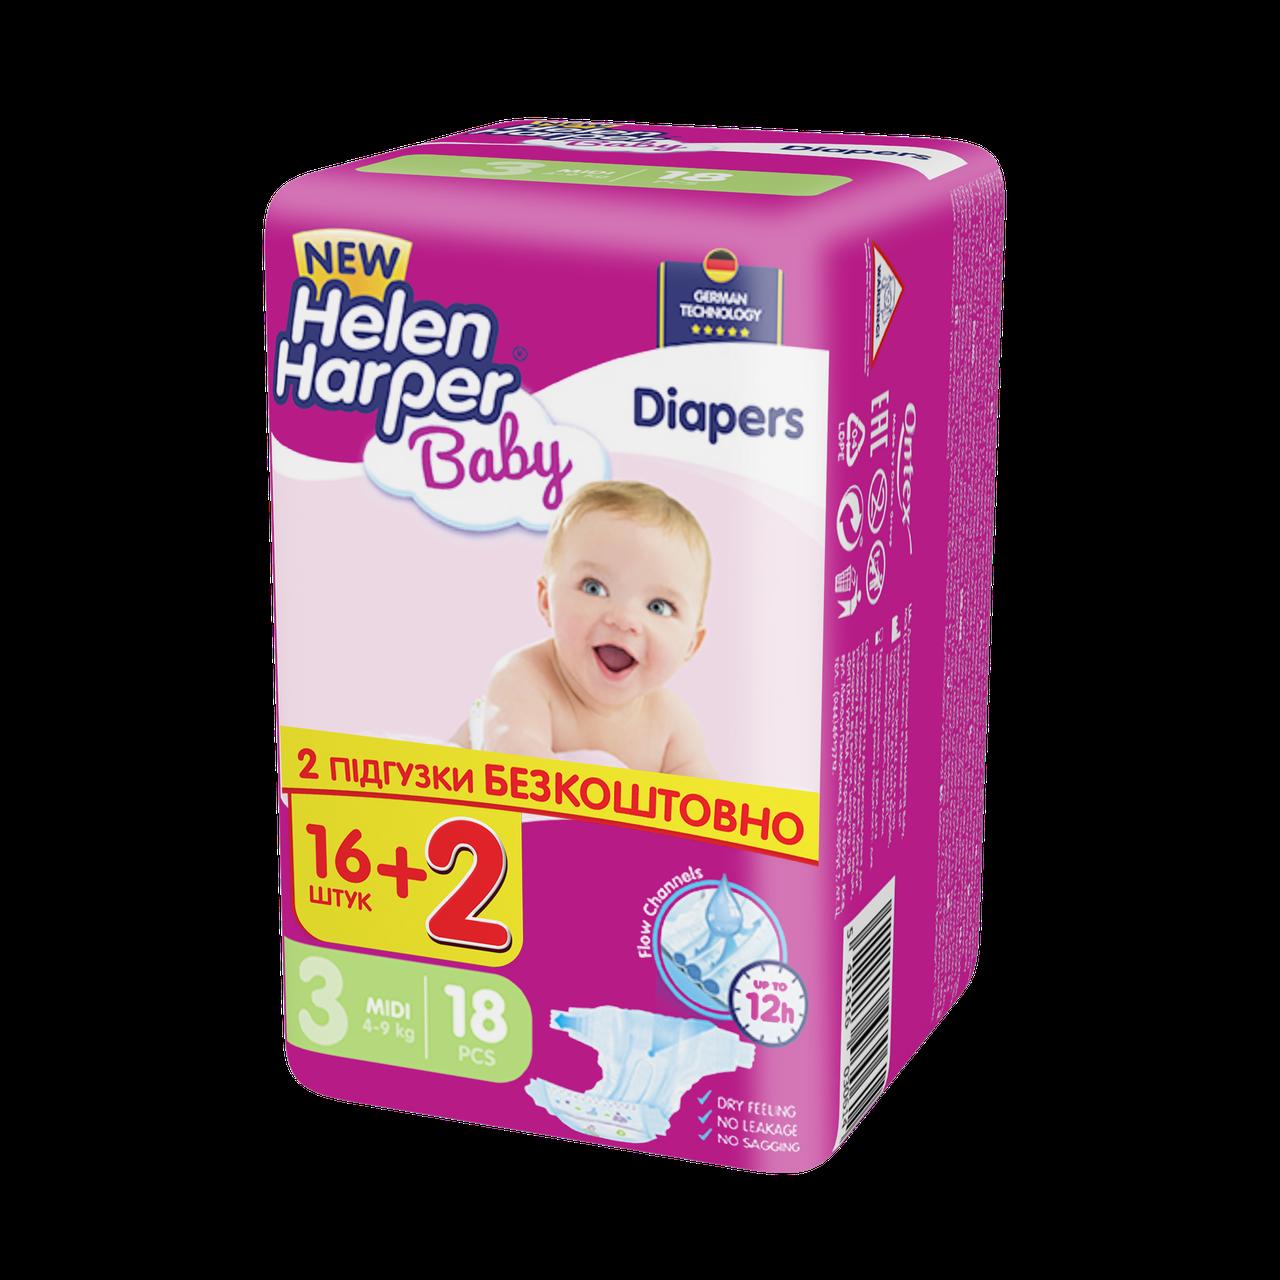 Підгузки Helen Harper Baby 3 (4-9кг), 18шт